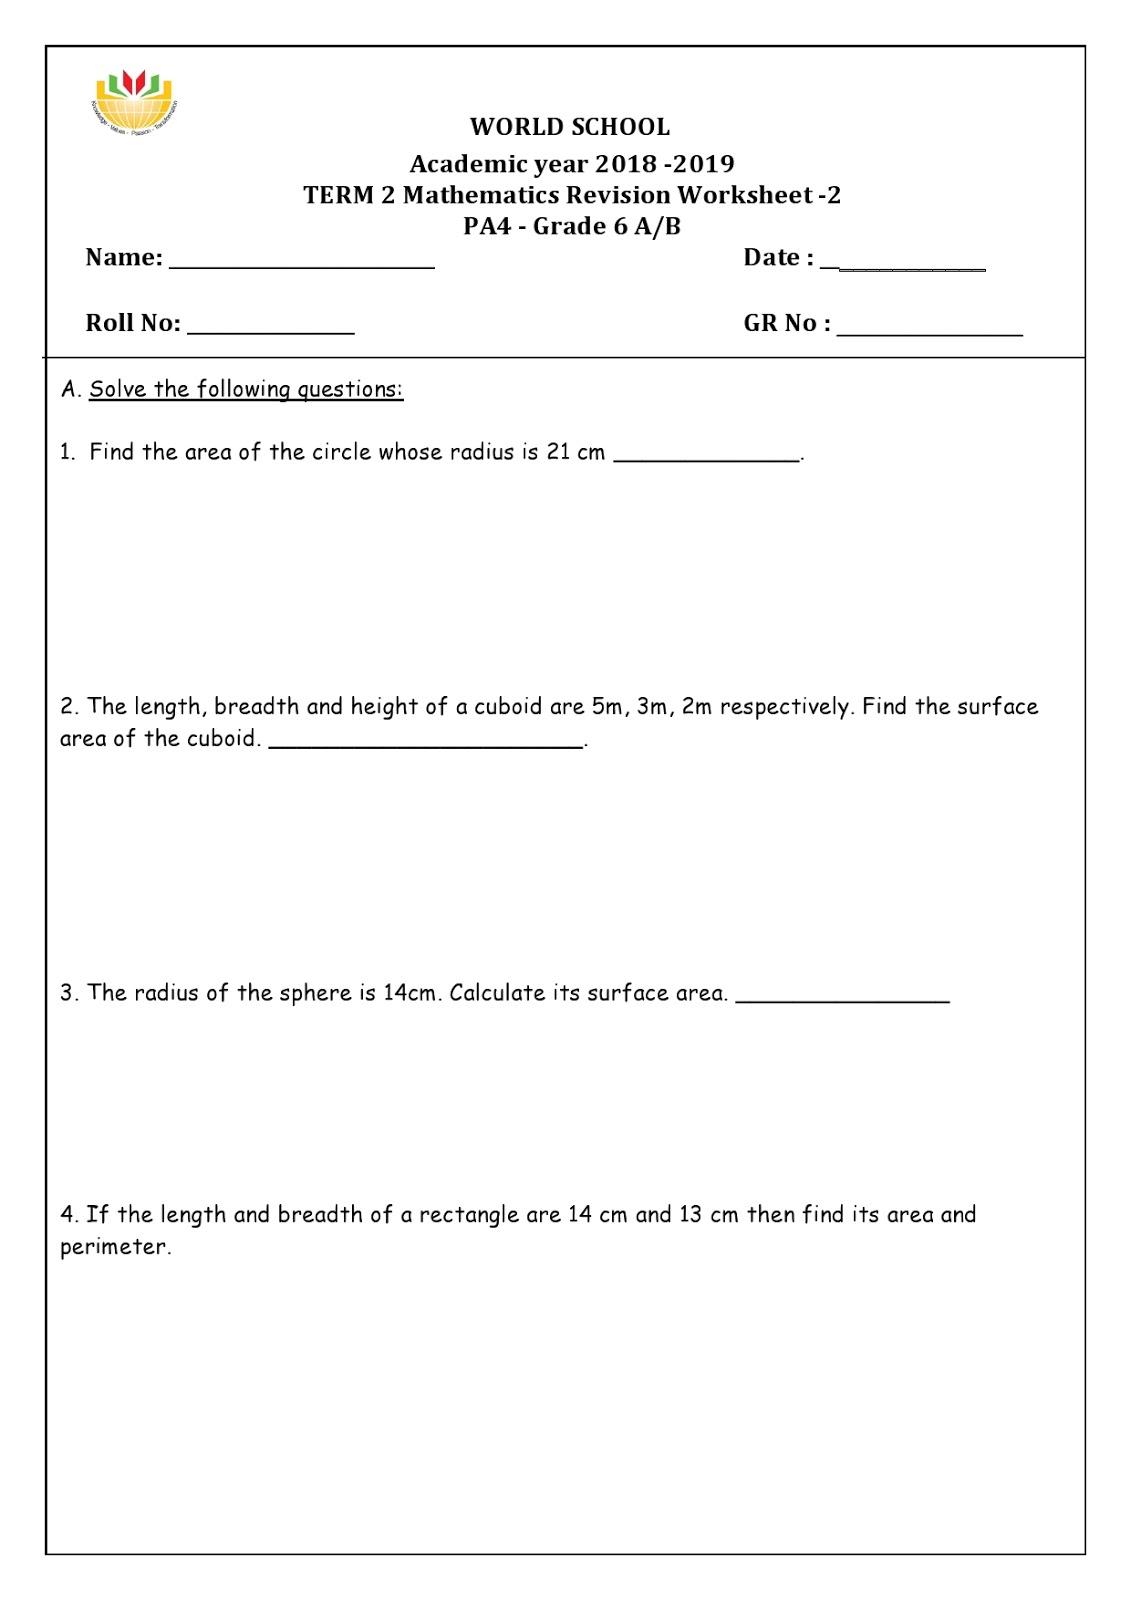 WORLD SCHOOL OMAN: Homework for Grade 6 as on 18-04-2019 [ 1600 x 1131 Pixel ]